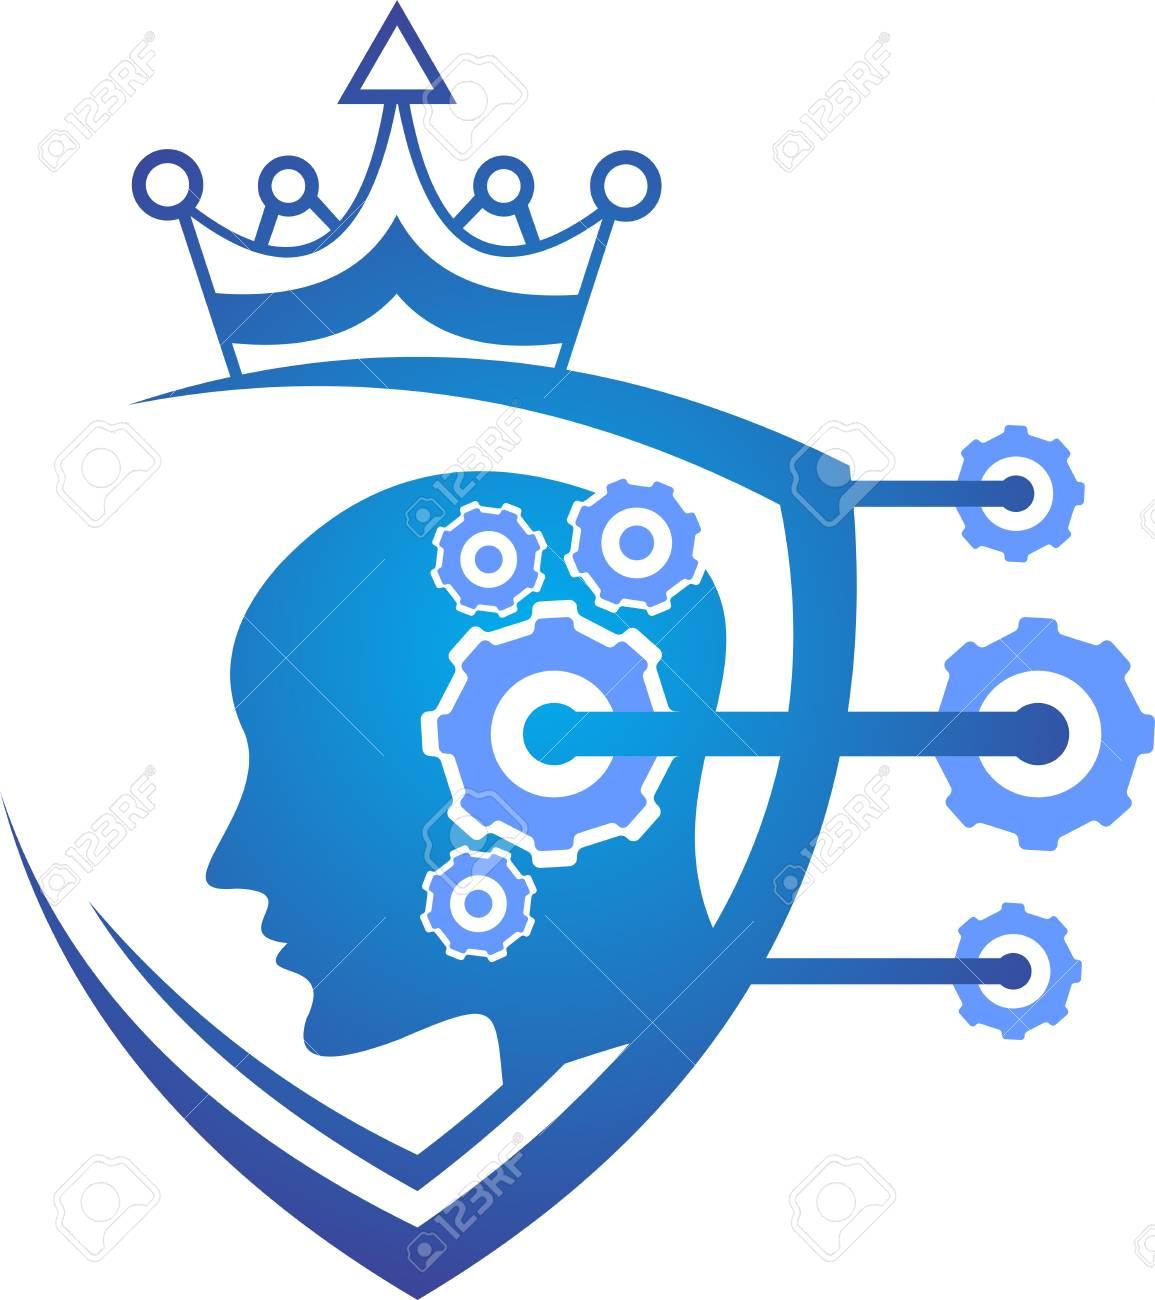 king human mechanic logo royalty free cliparts vectors and stock rh 123rf com mechanic logo templates mechanic logo clocks